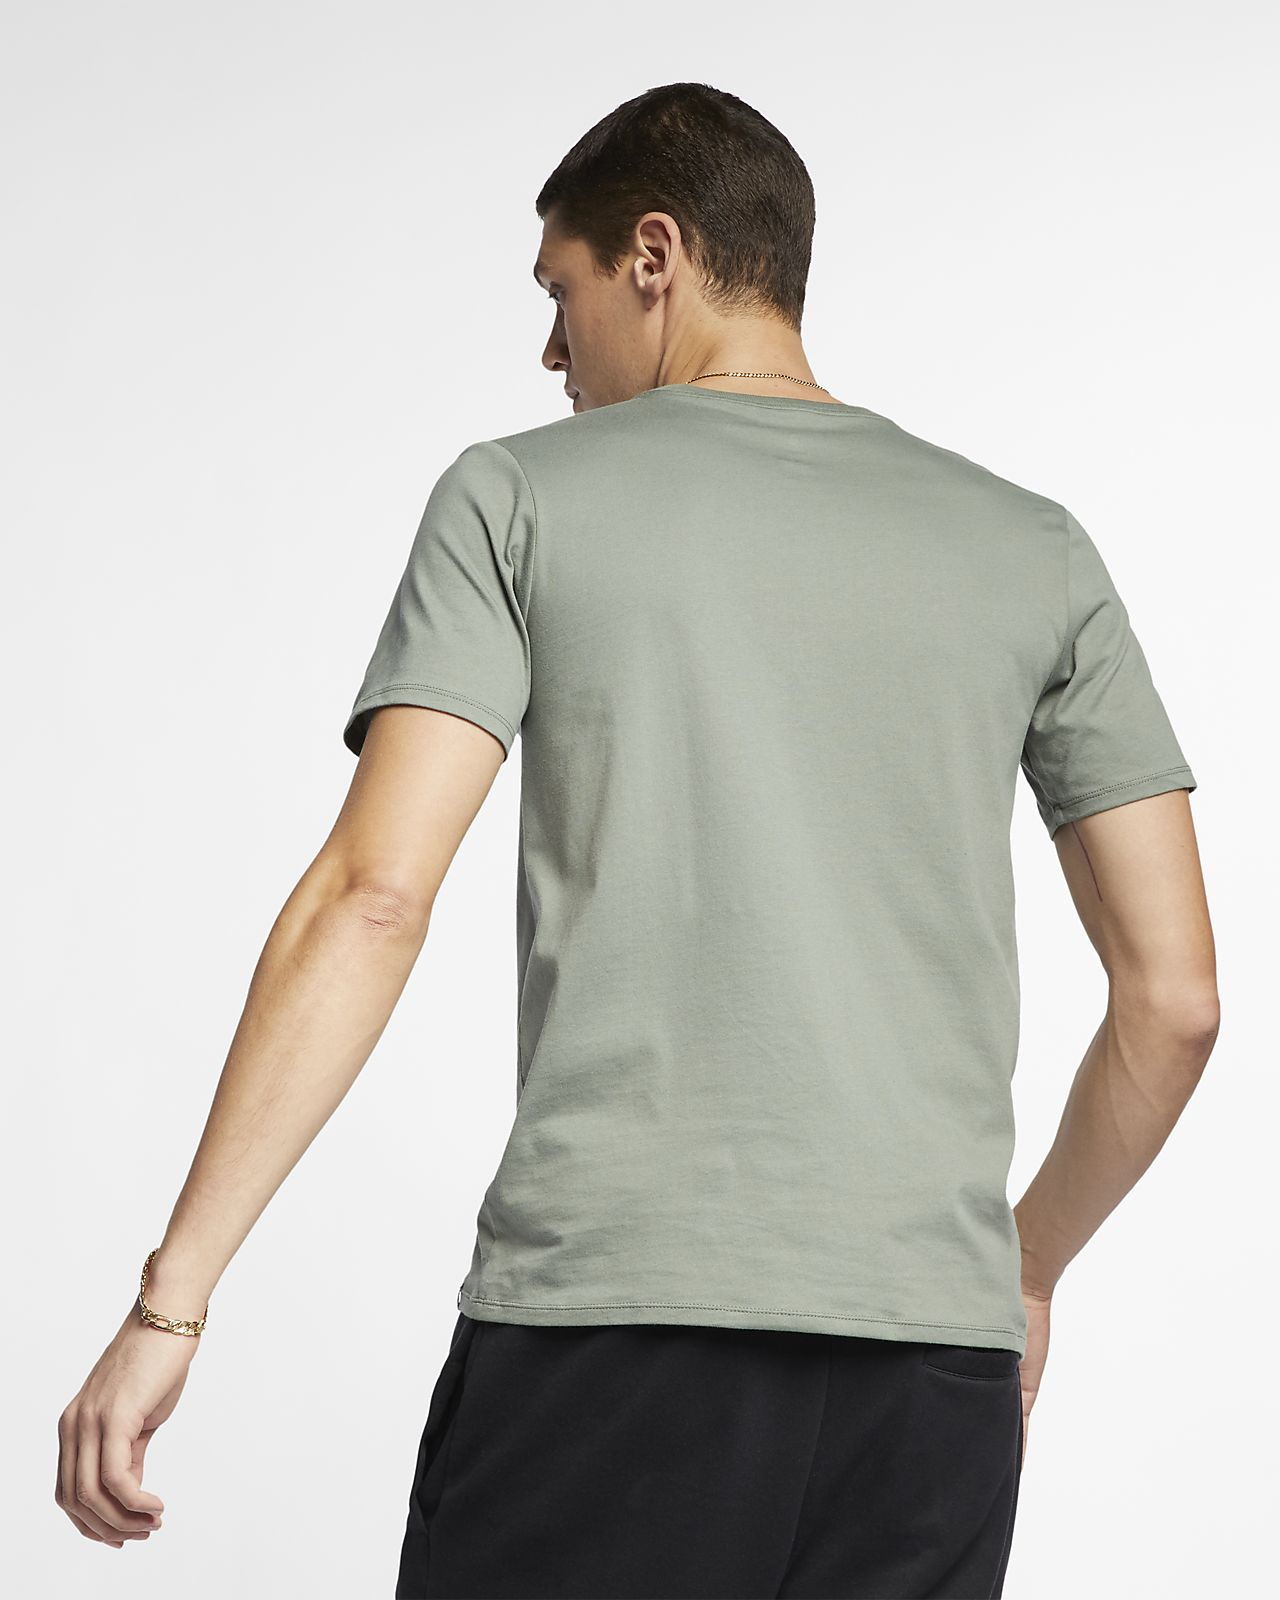 1804a377a21e Jordan Sportswear Jumpman Air Men s T-Shirt. Nike.com HU